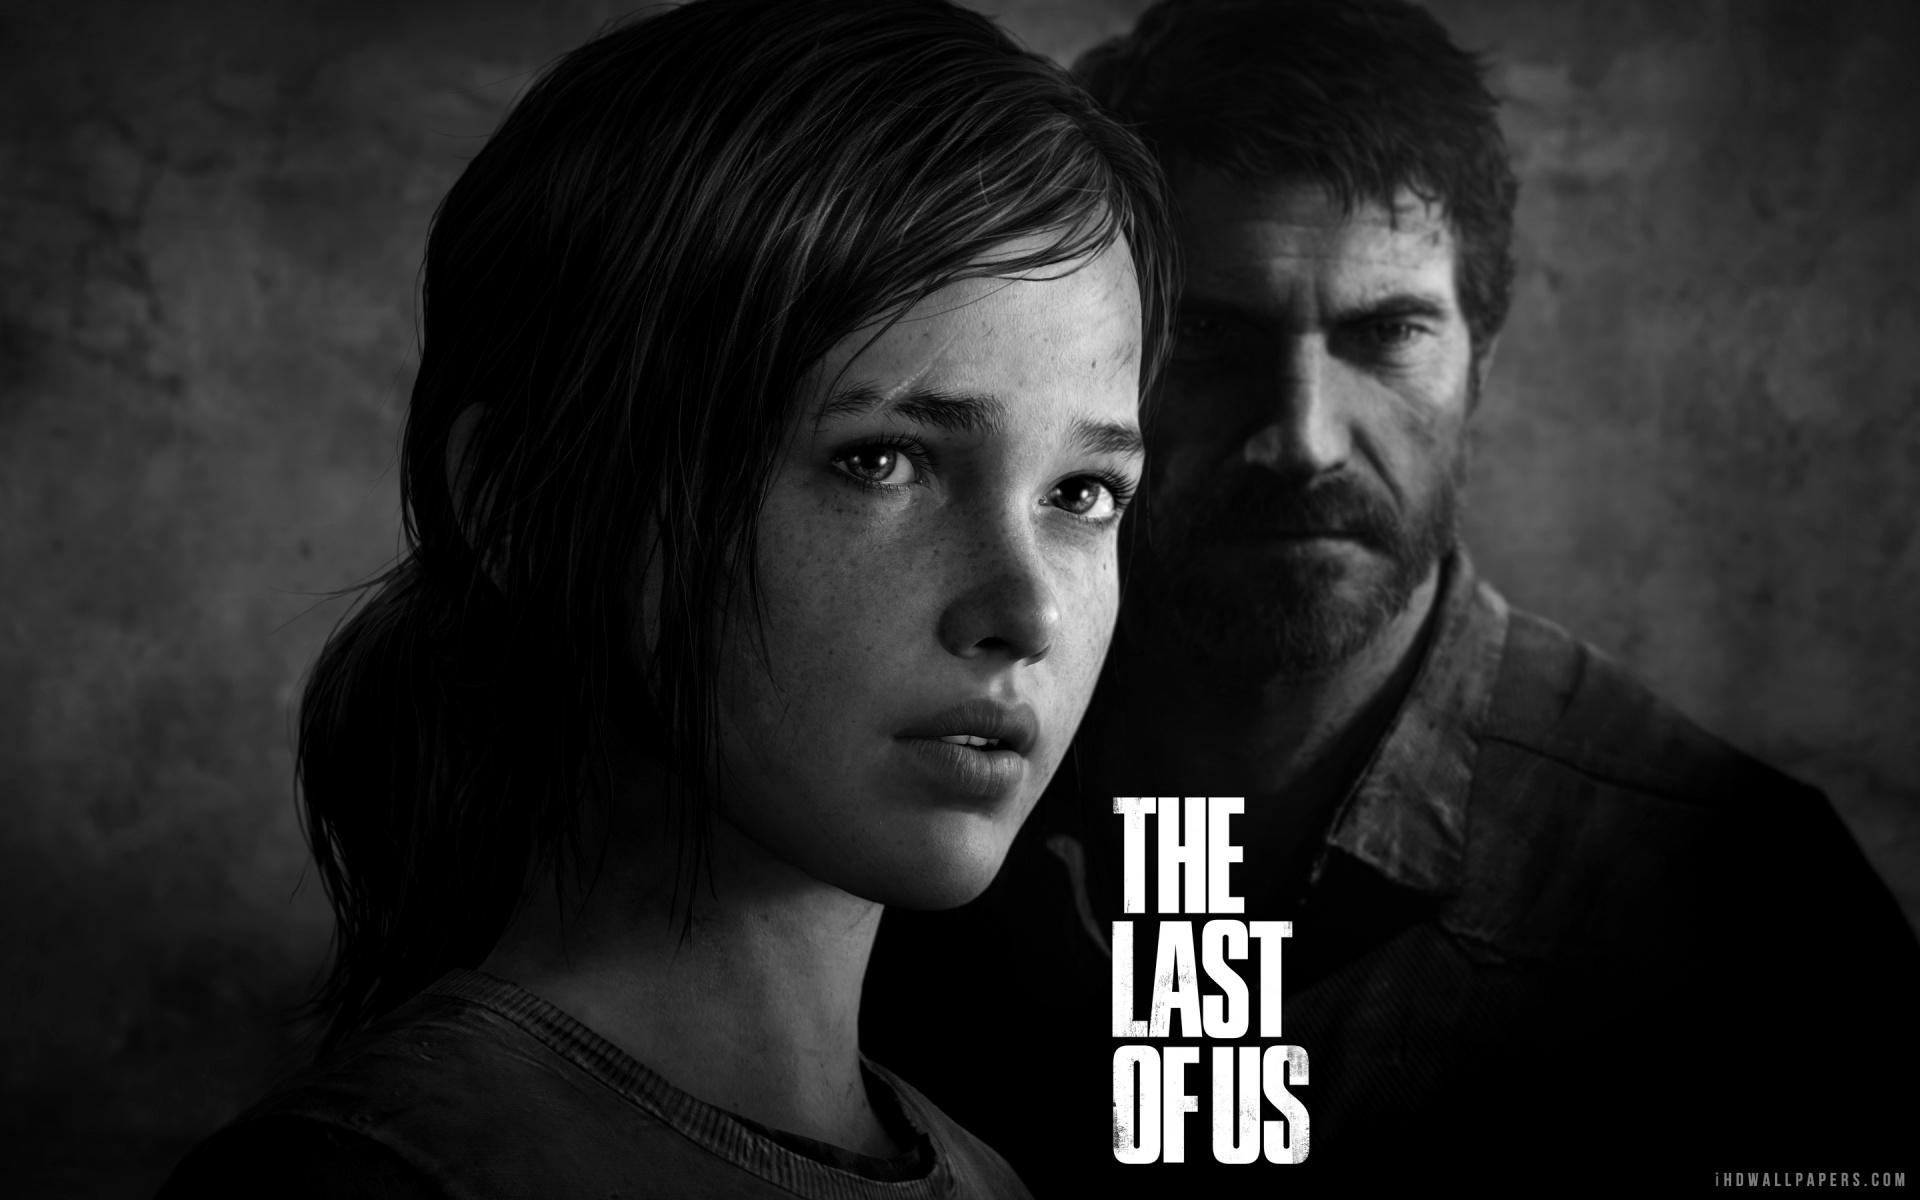 Ellie Joel in The Last of Us HD Wallpaper   iHD Wallpapers 1920x1200